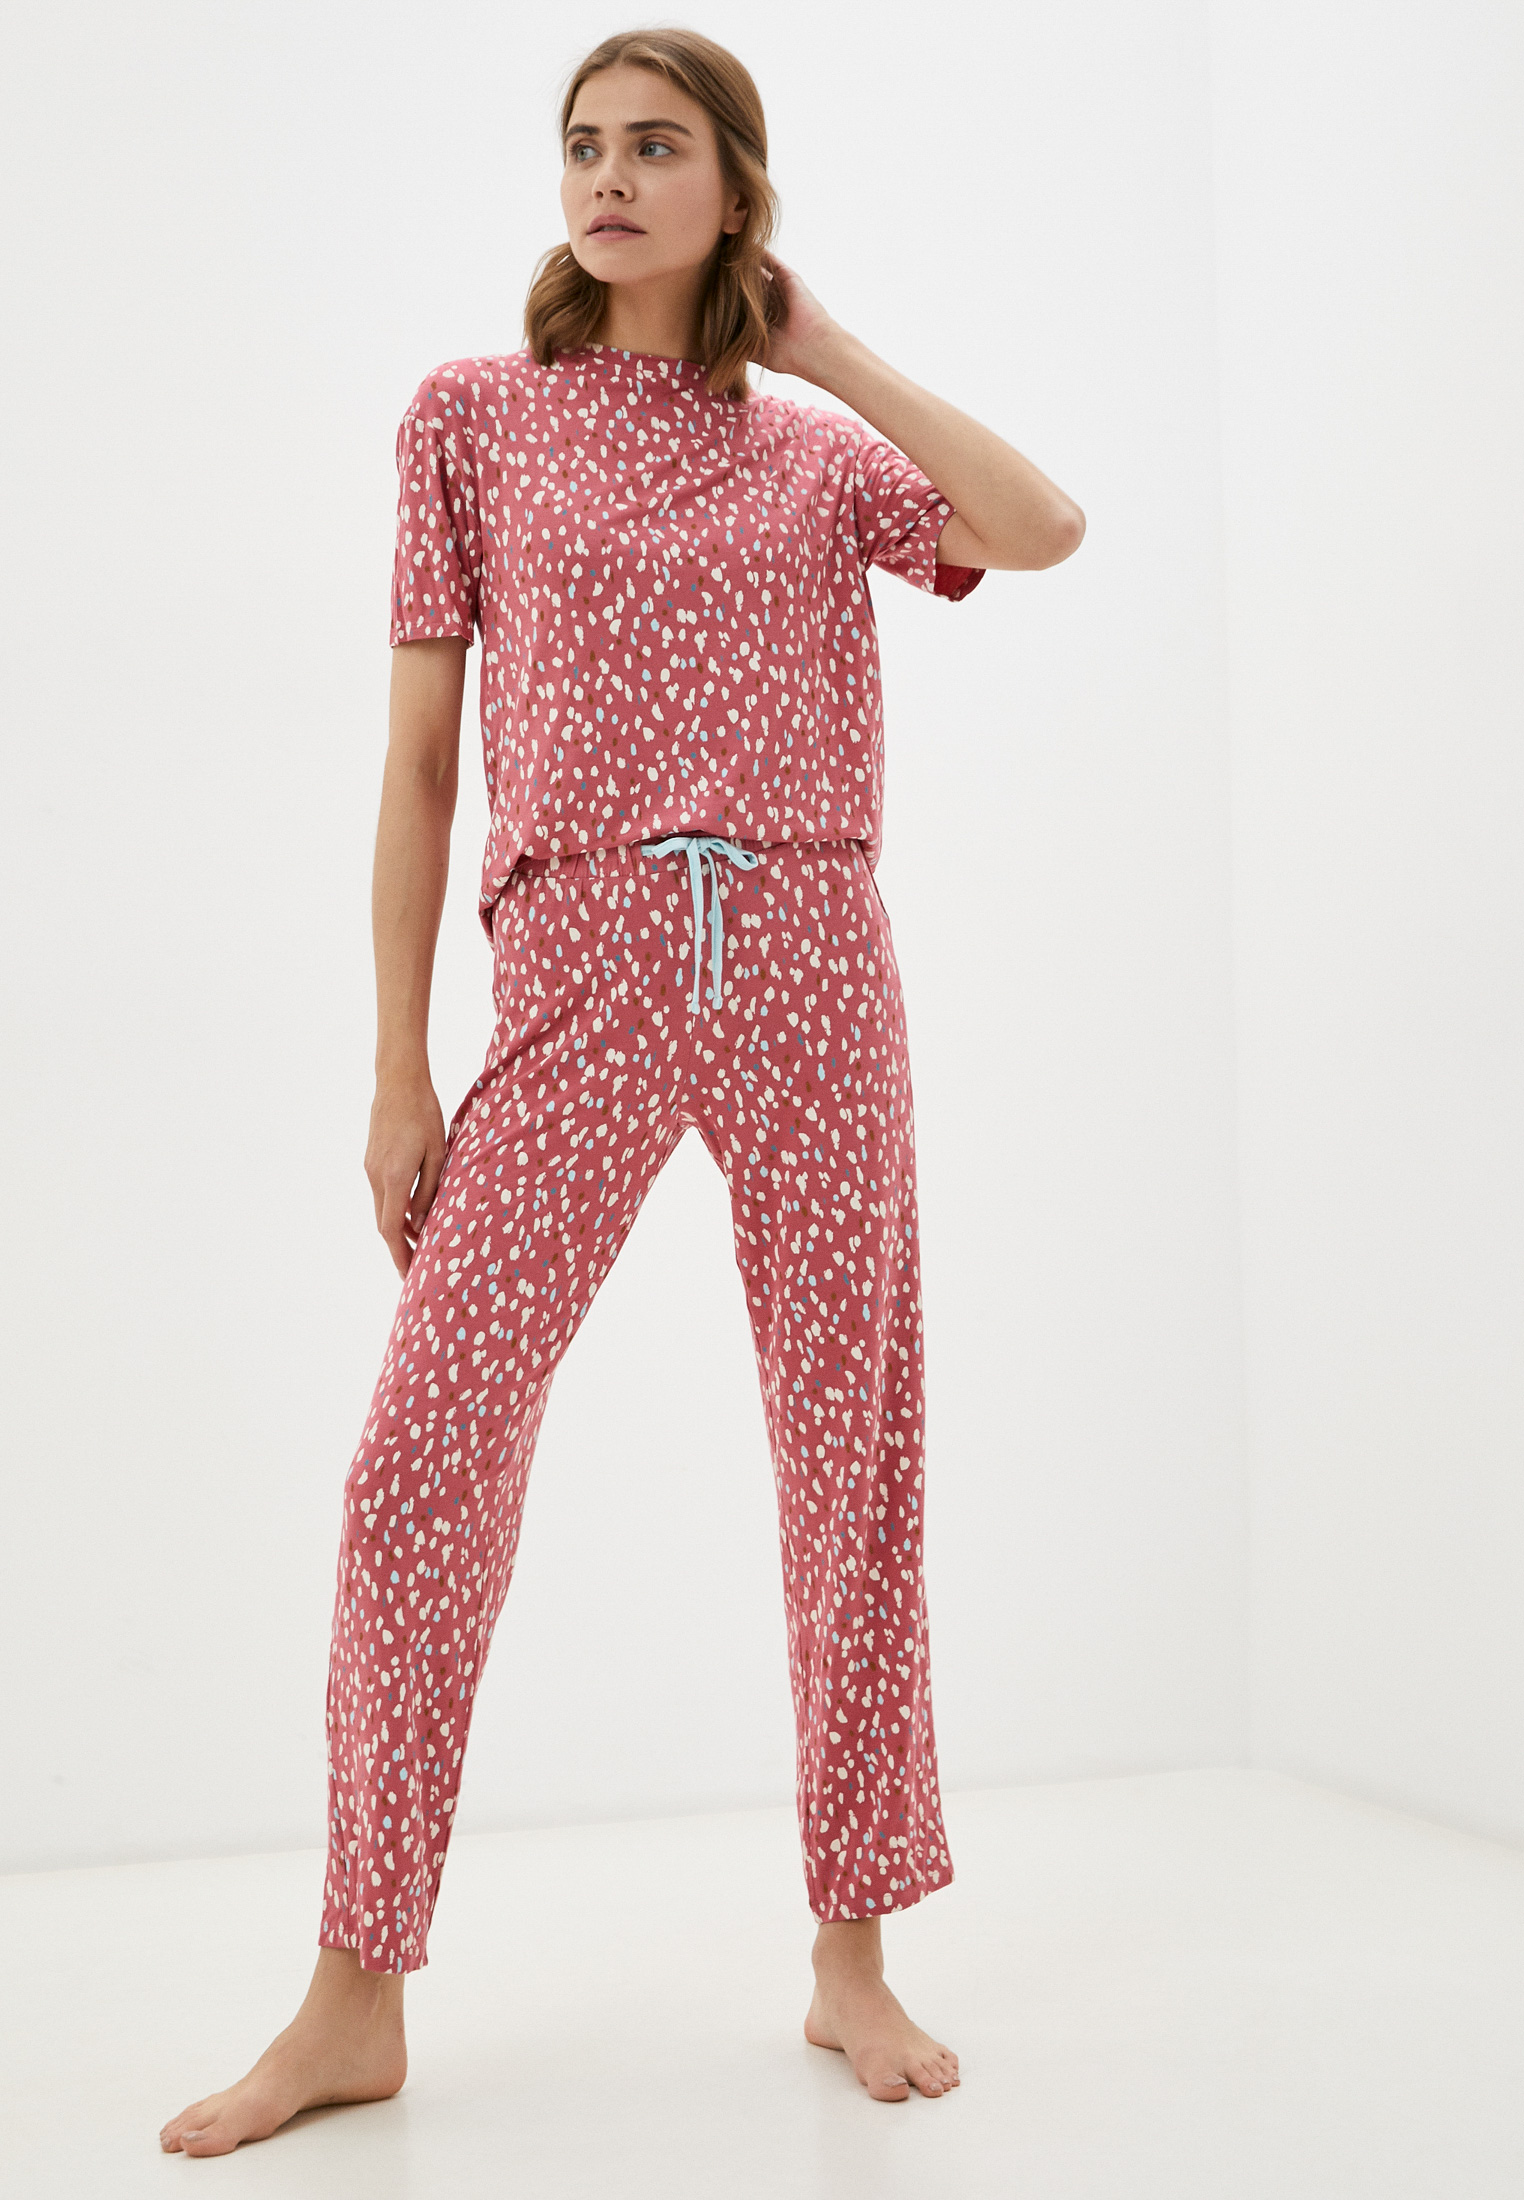 Женское белье и одежда для дома Marks & Spencer Пижама Marks & Spencer